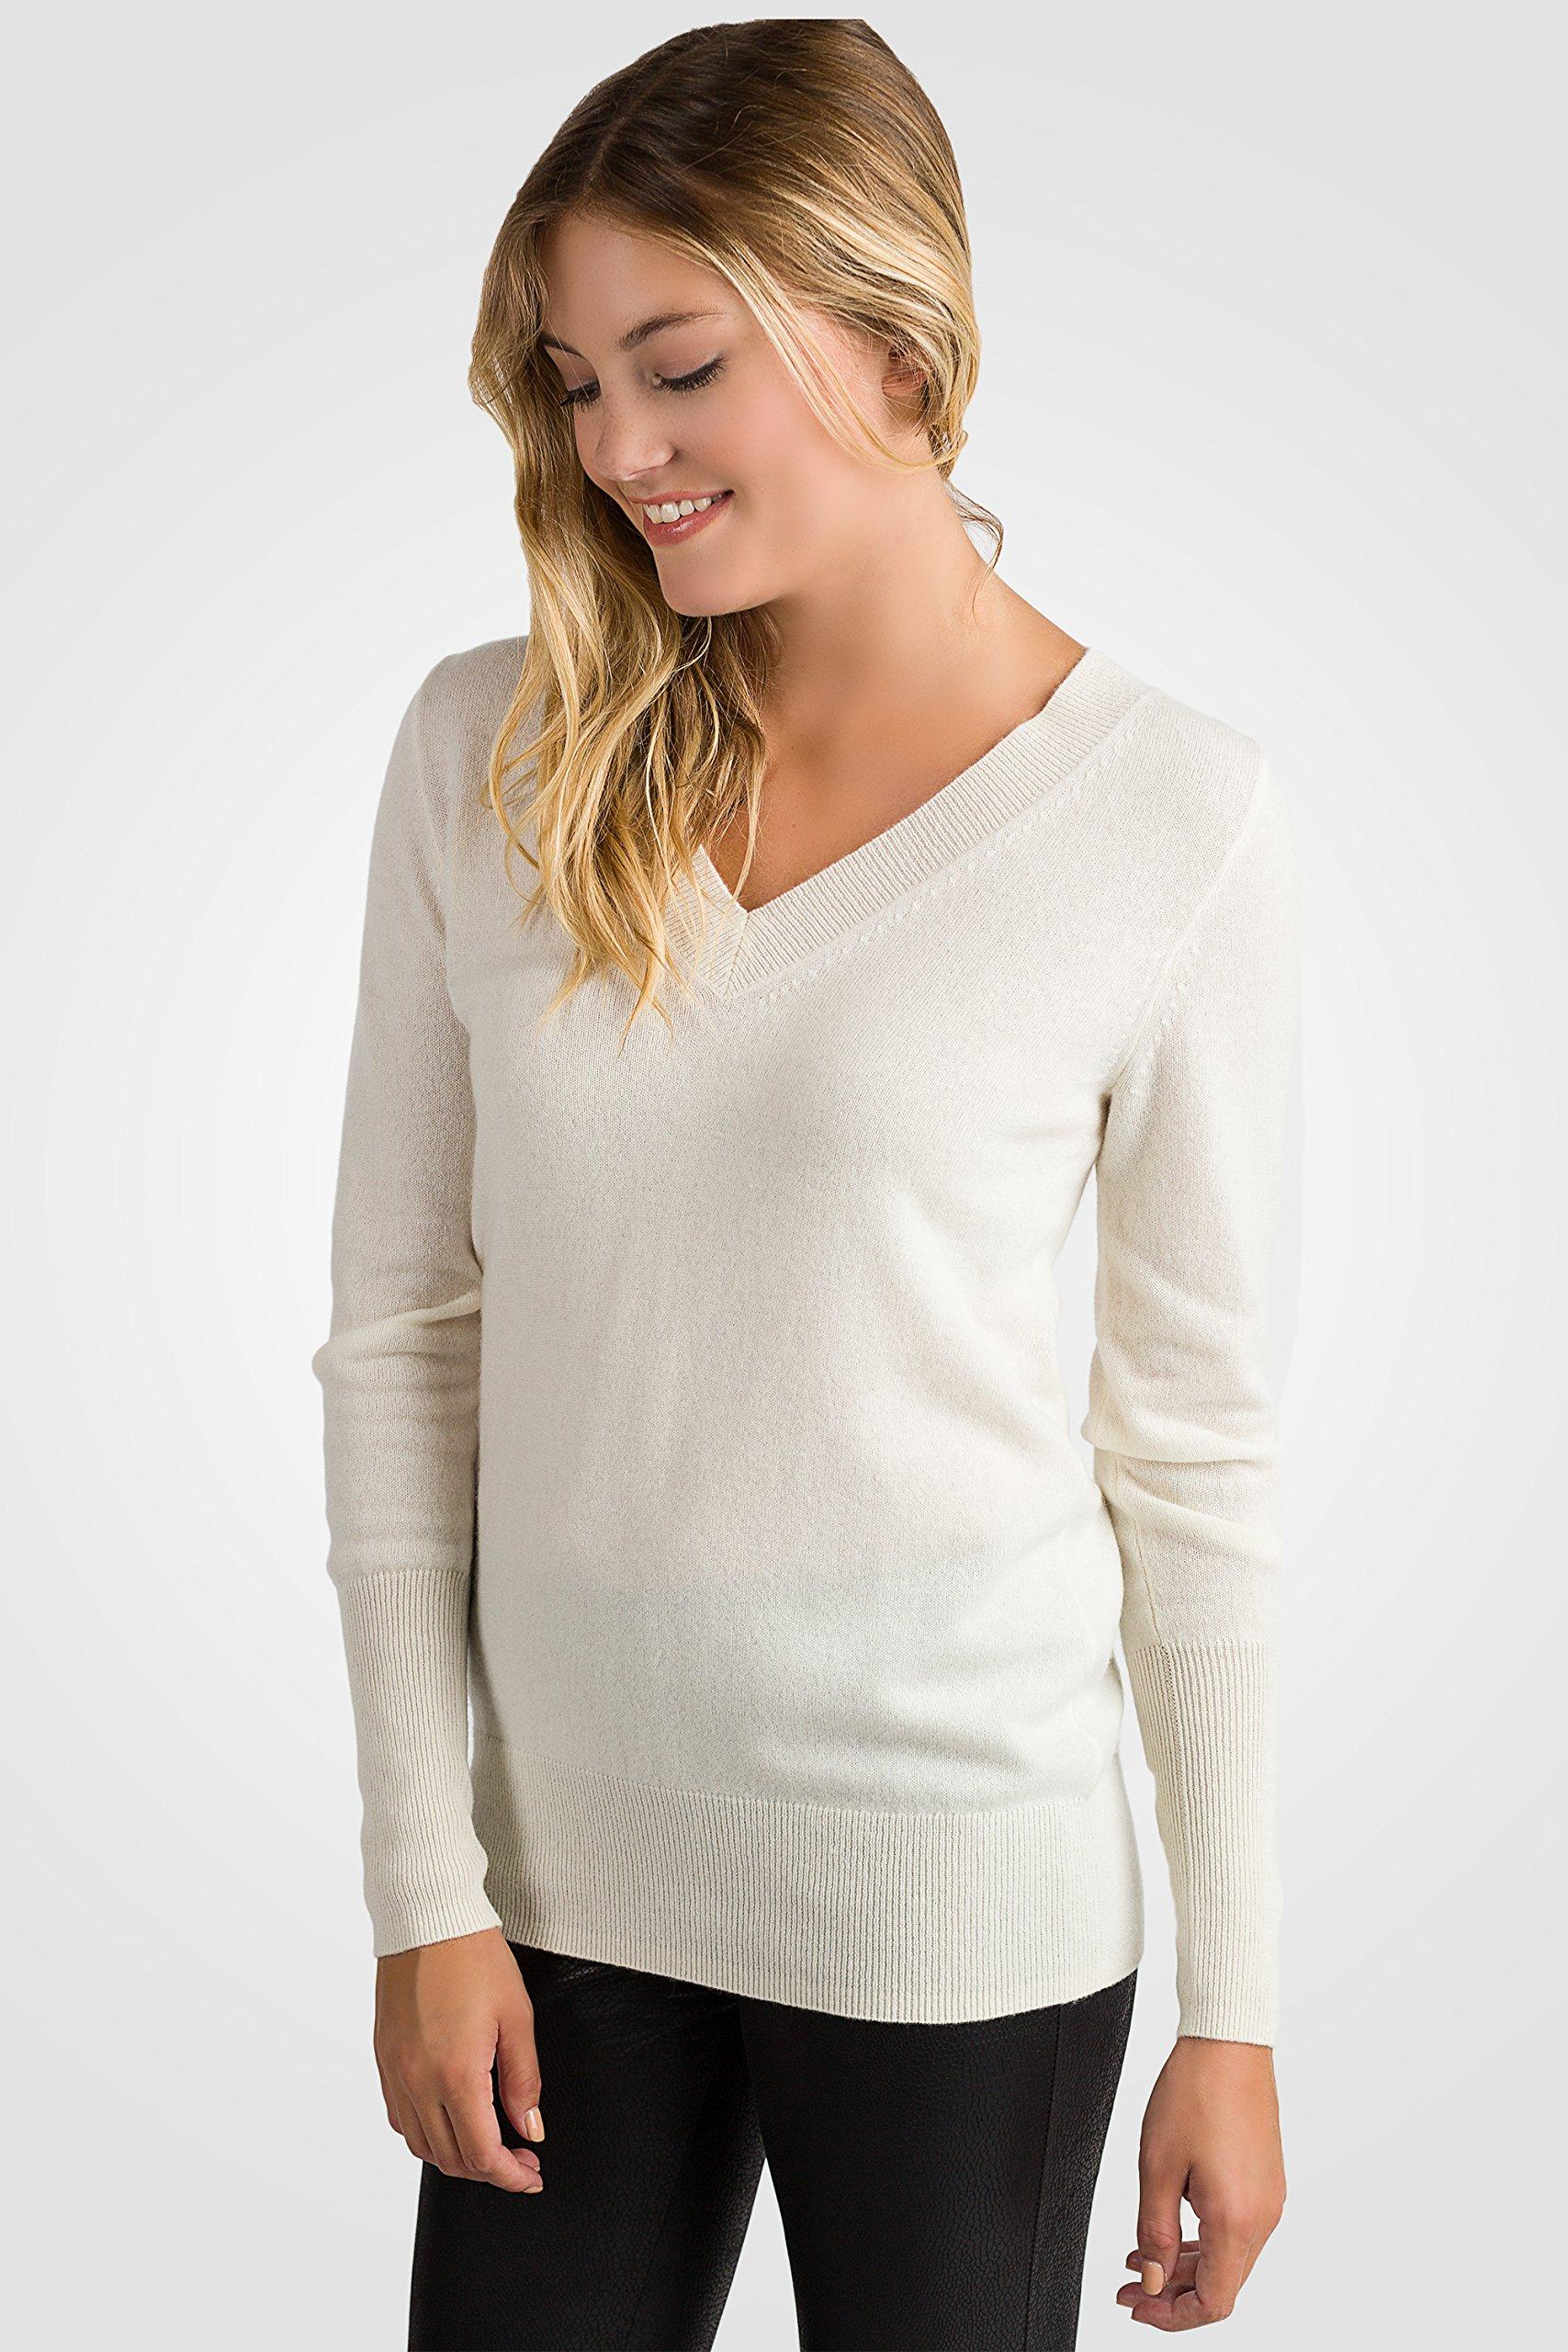 JENNIE LIU Women's 100% Pure Cashmere Long Sleeve Ava V Neck Pullover Sweater (PM, Cream) by JENNIE LIU (Image #4)